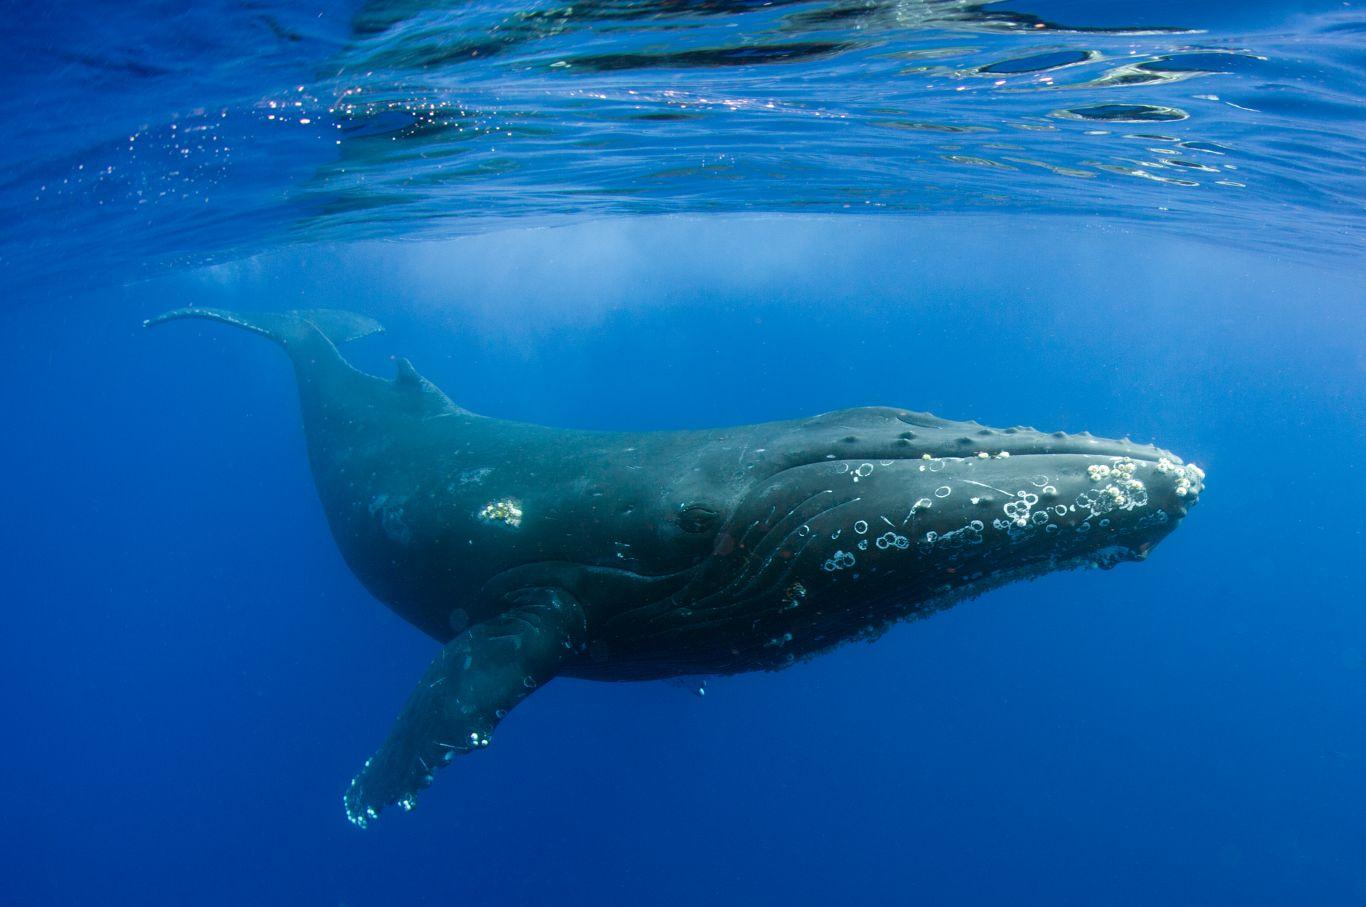 Baleia jubarte Baía de Guanabara